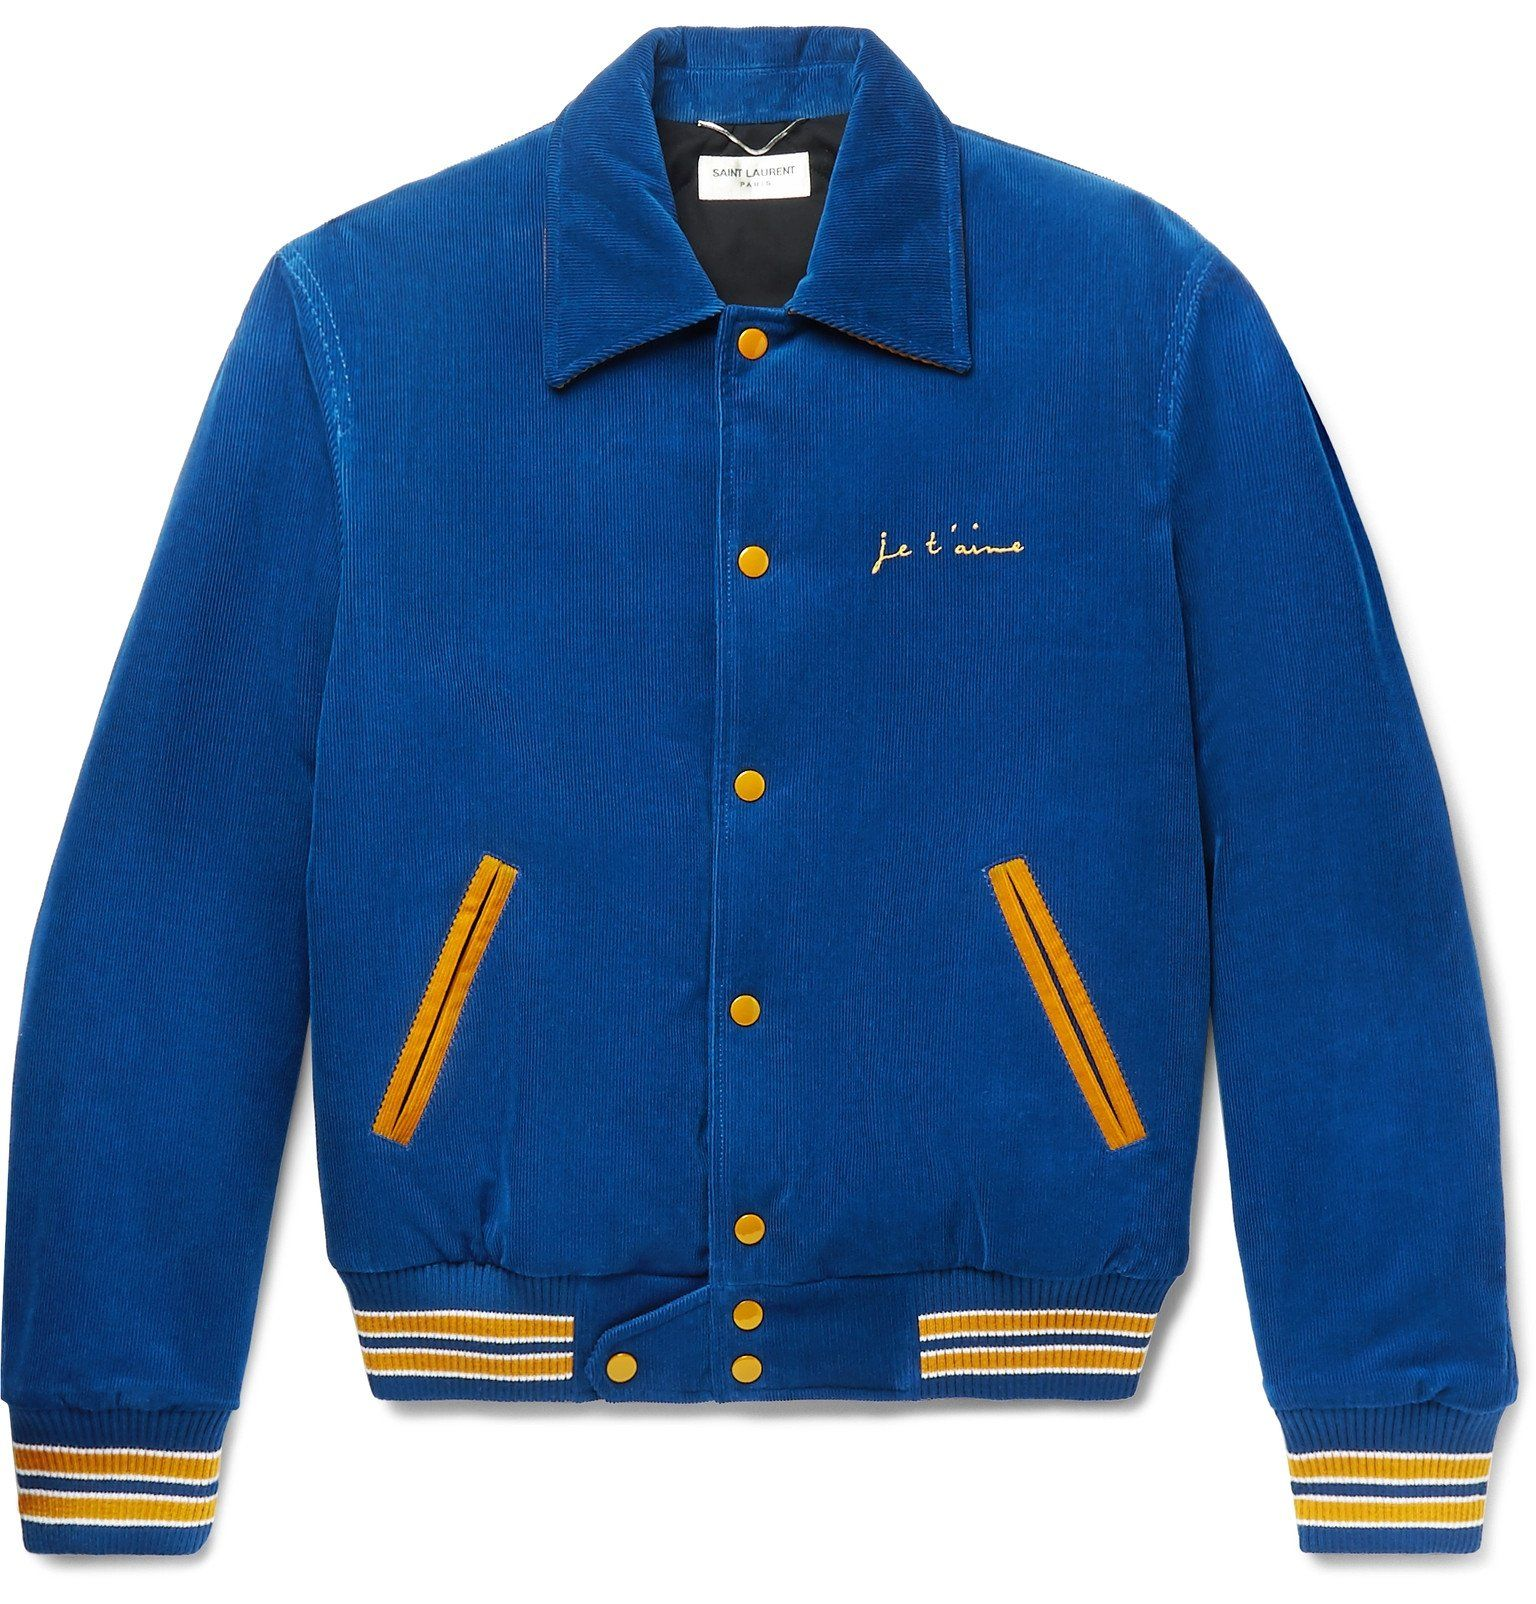 Vintage Corduroy Blue Bomber Jacket By Saint Laurent Mens Jackets Mens Outfits Blue Bomber Jacket